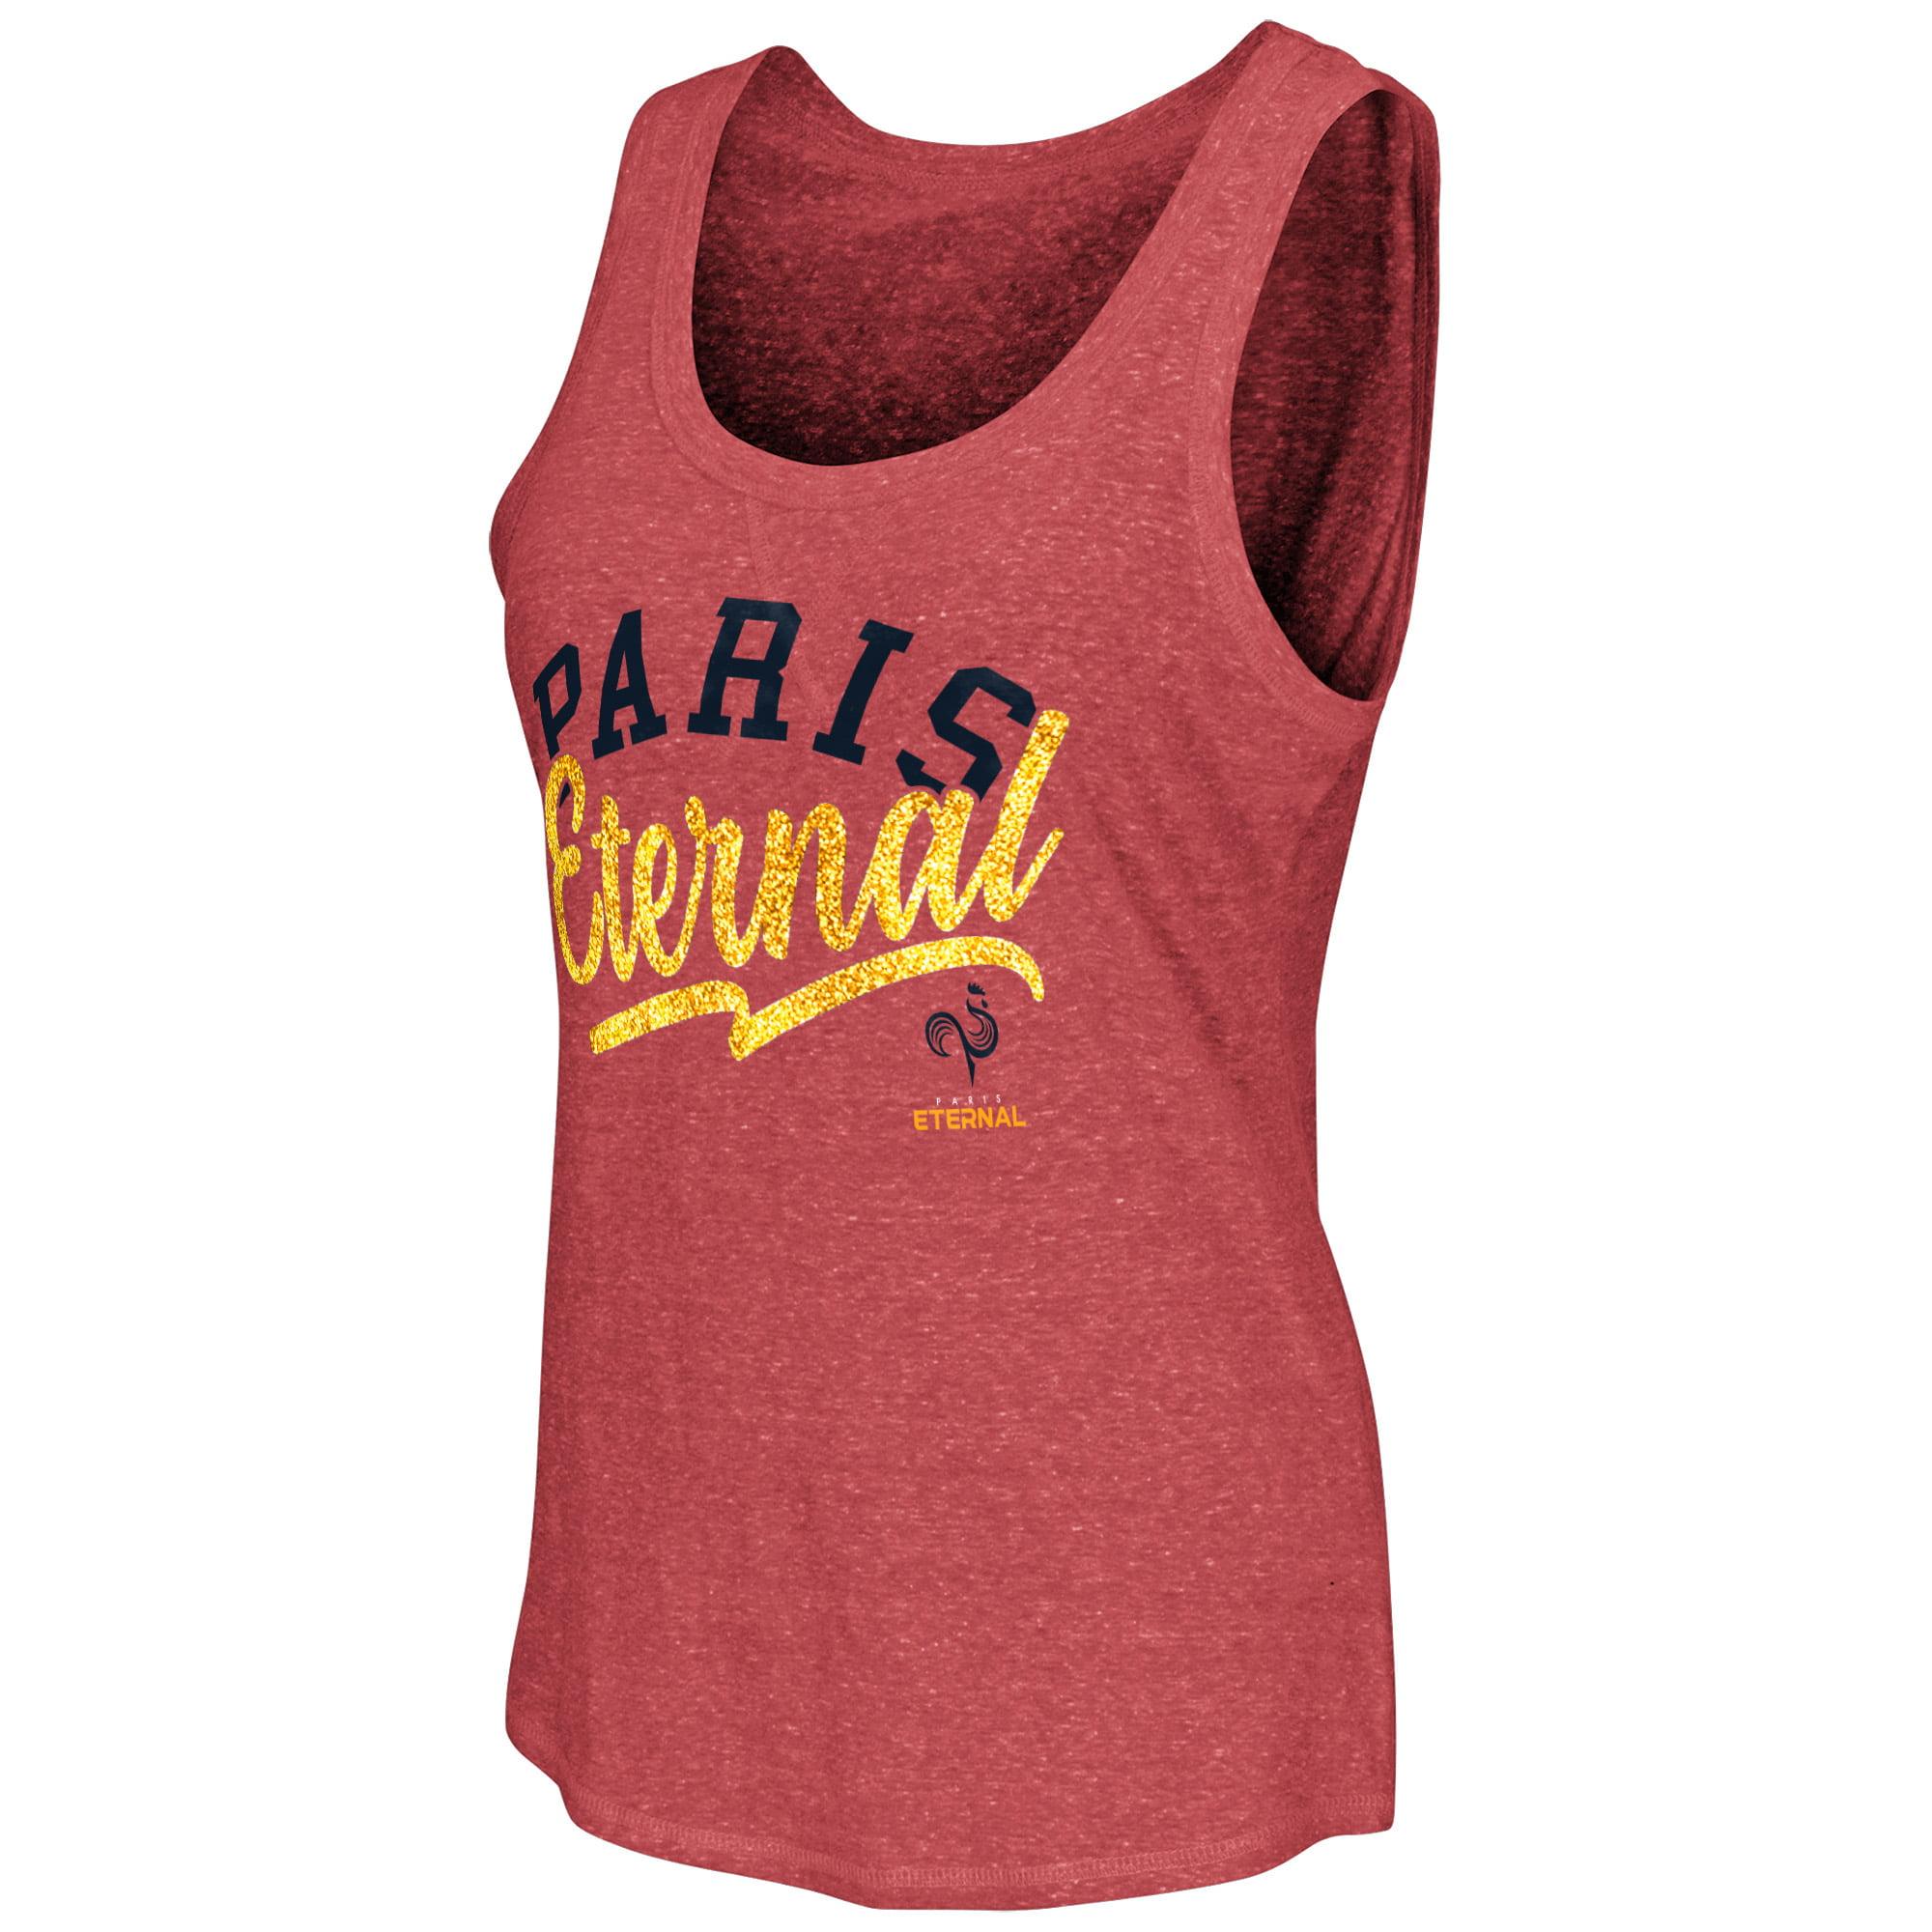 Paris Eternal G-III Sports by Carl Banks Women's Playoff Tri-Blend Tank Top - Red